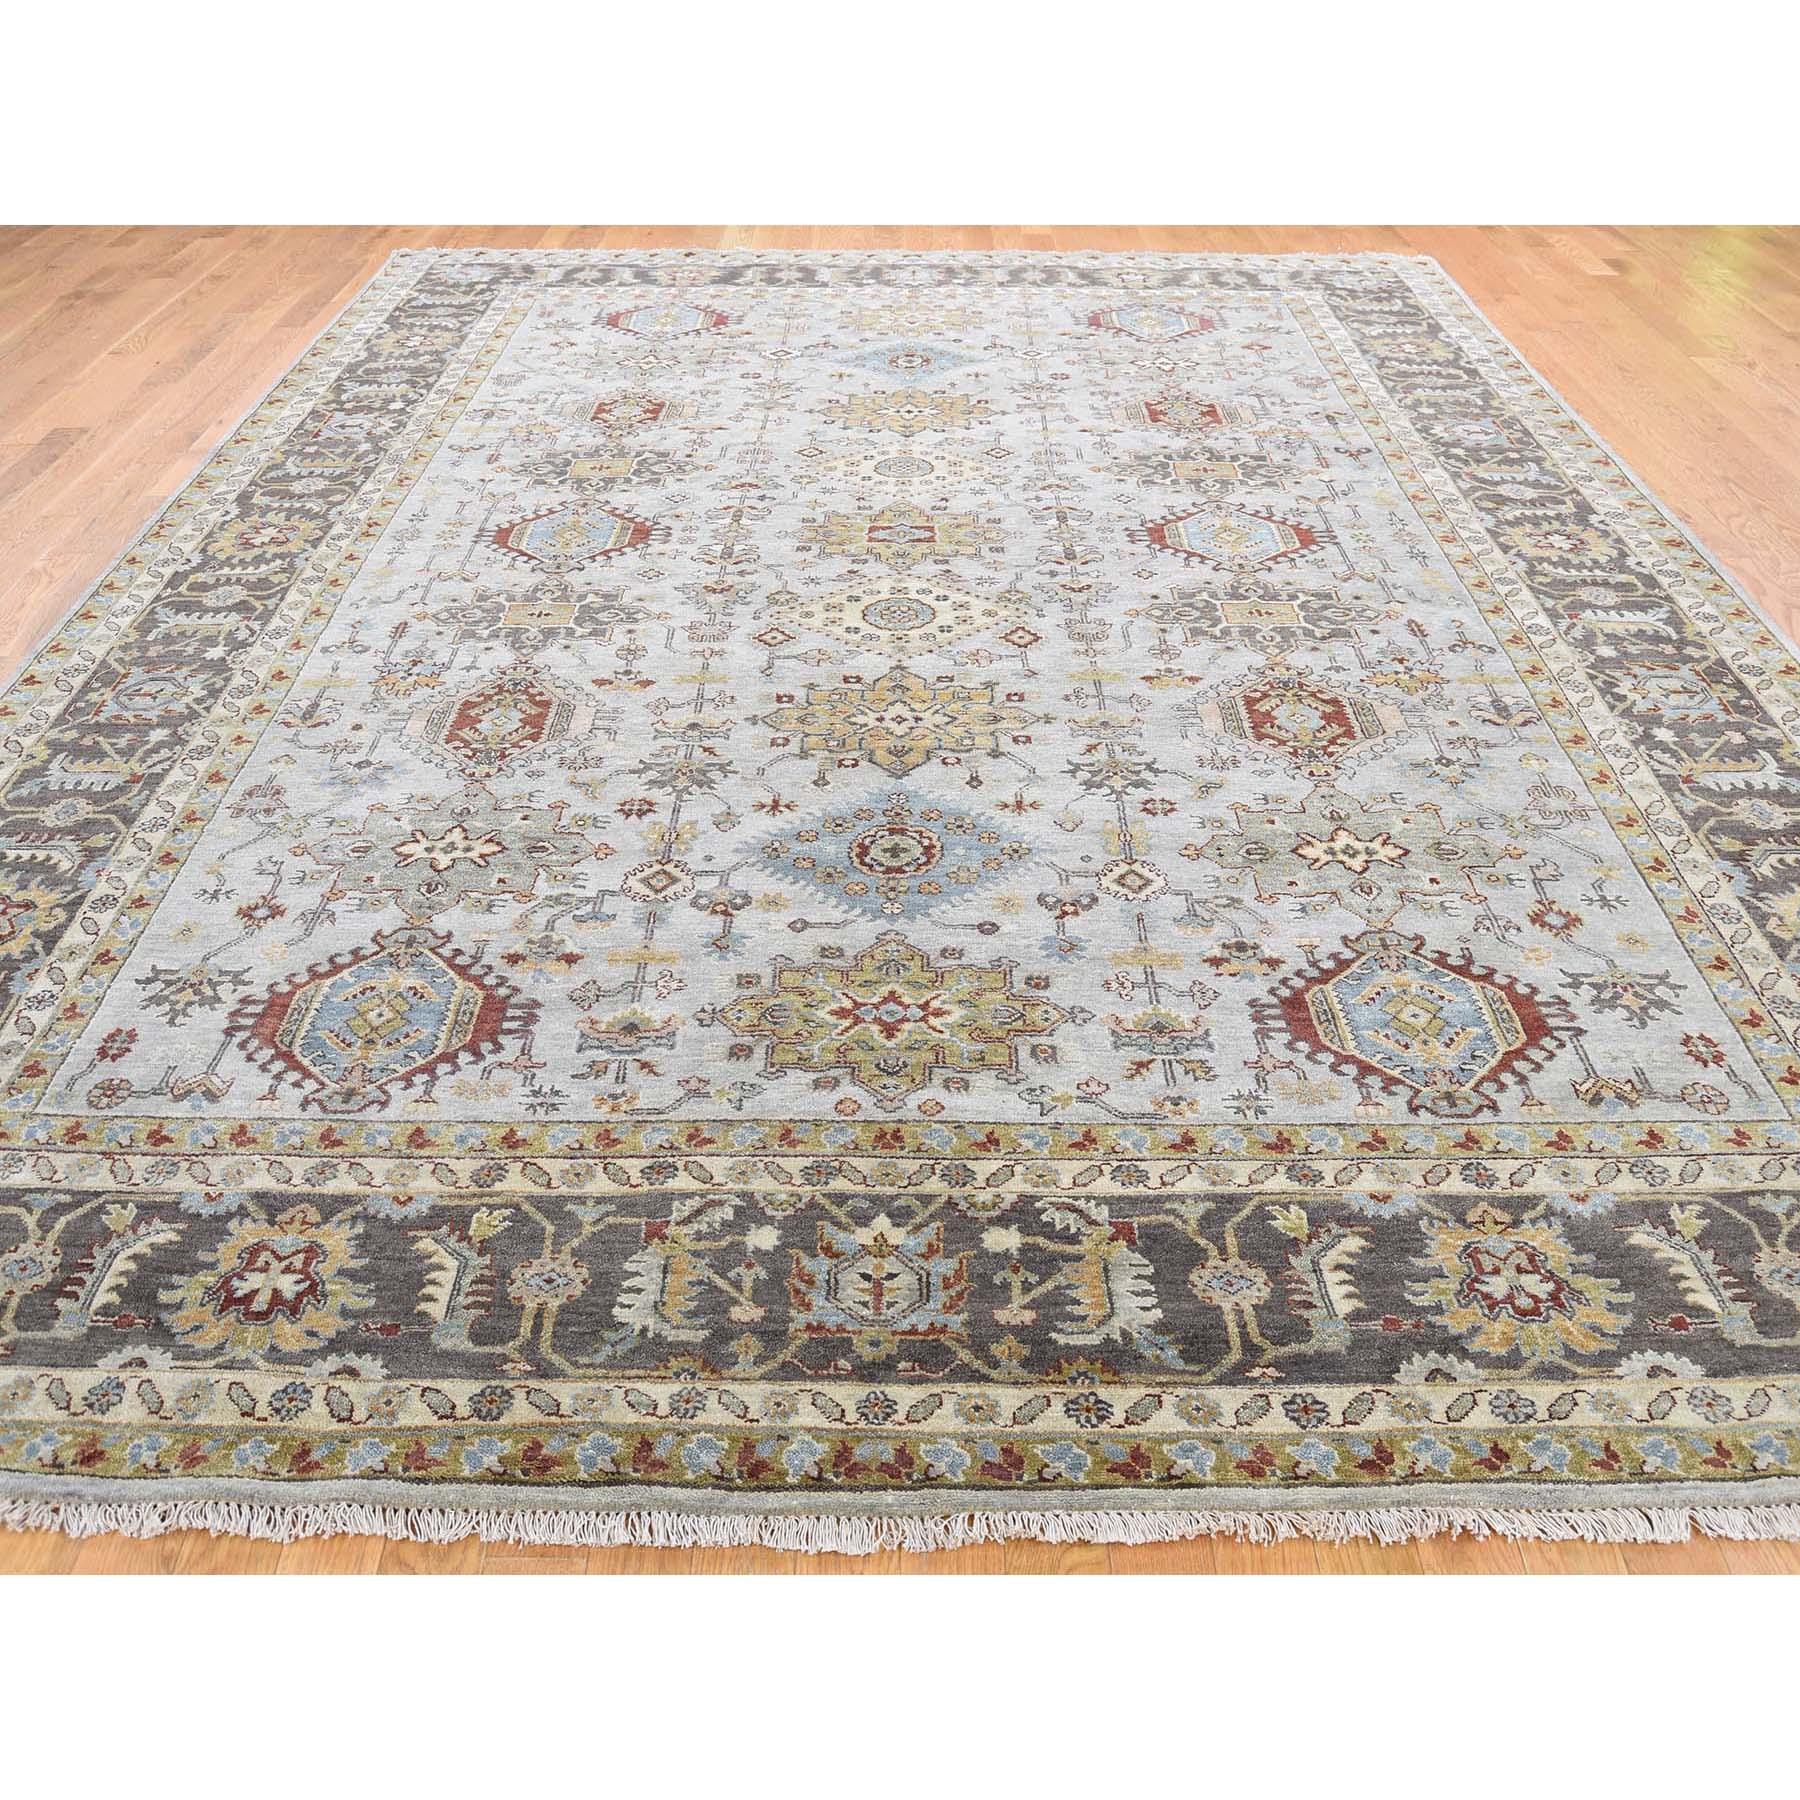 "8'10""x11'9"" Pure Wool Hand-Knotted Karajeh Design Oriental Rug"